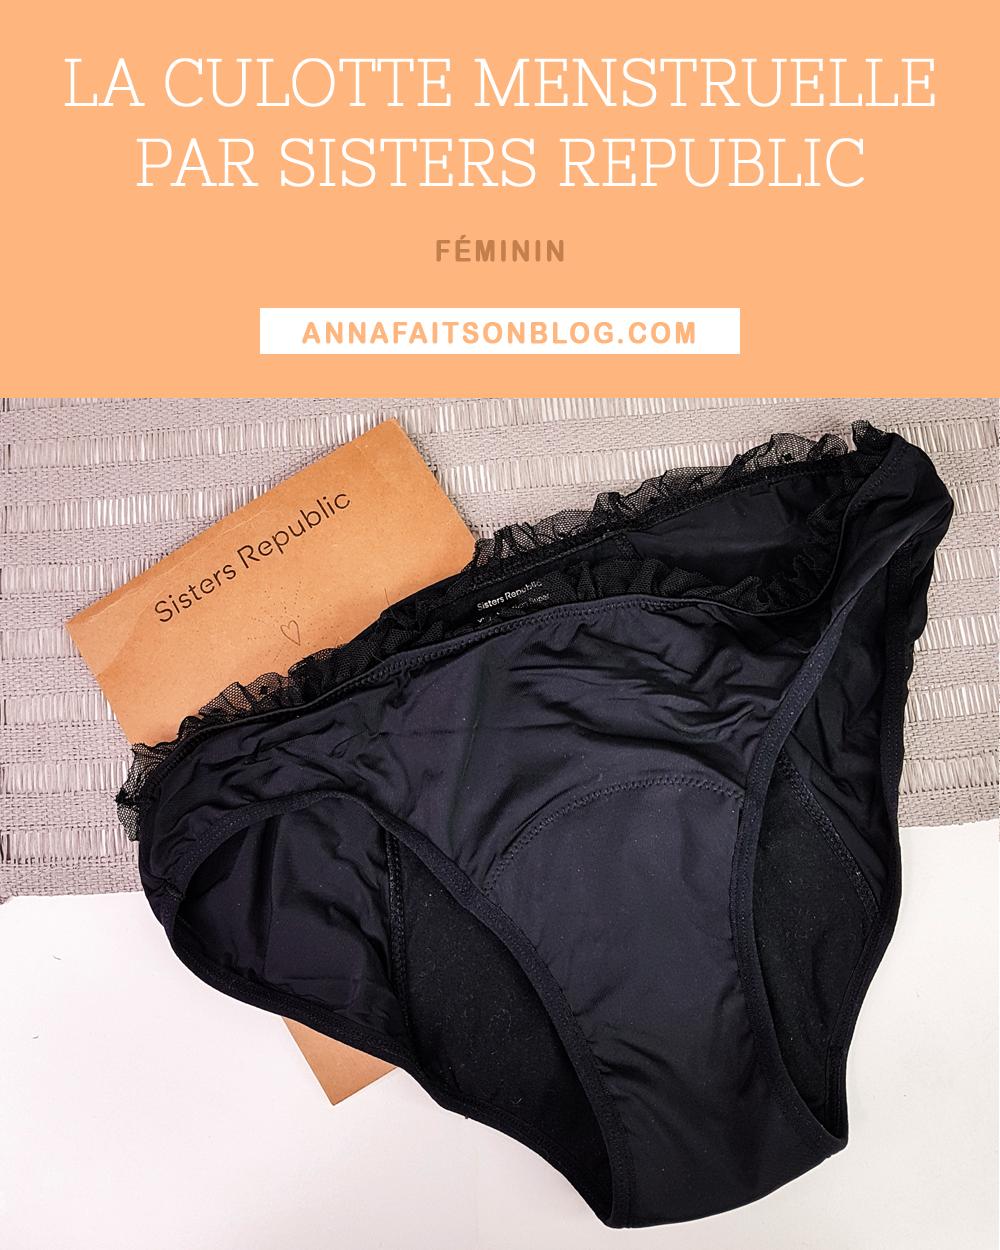 Culotte menstruelle Sisters Republic